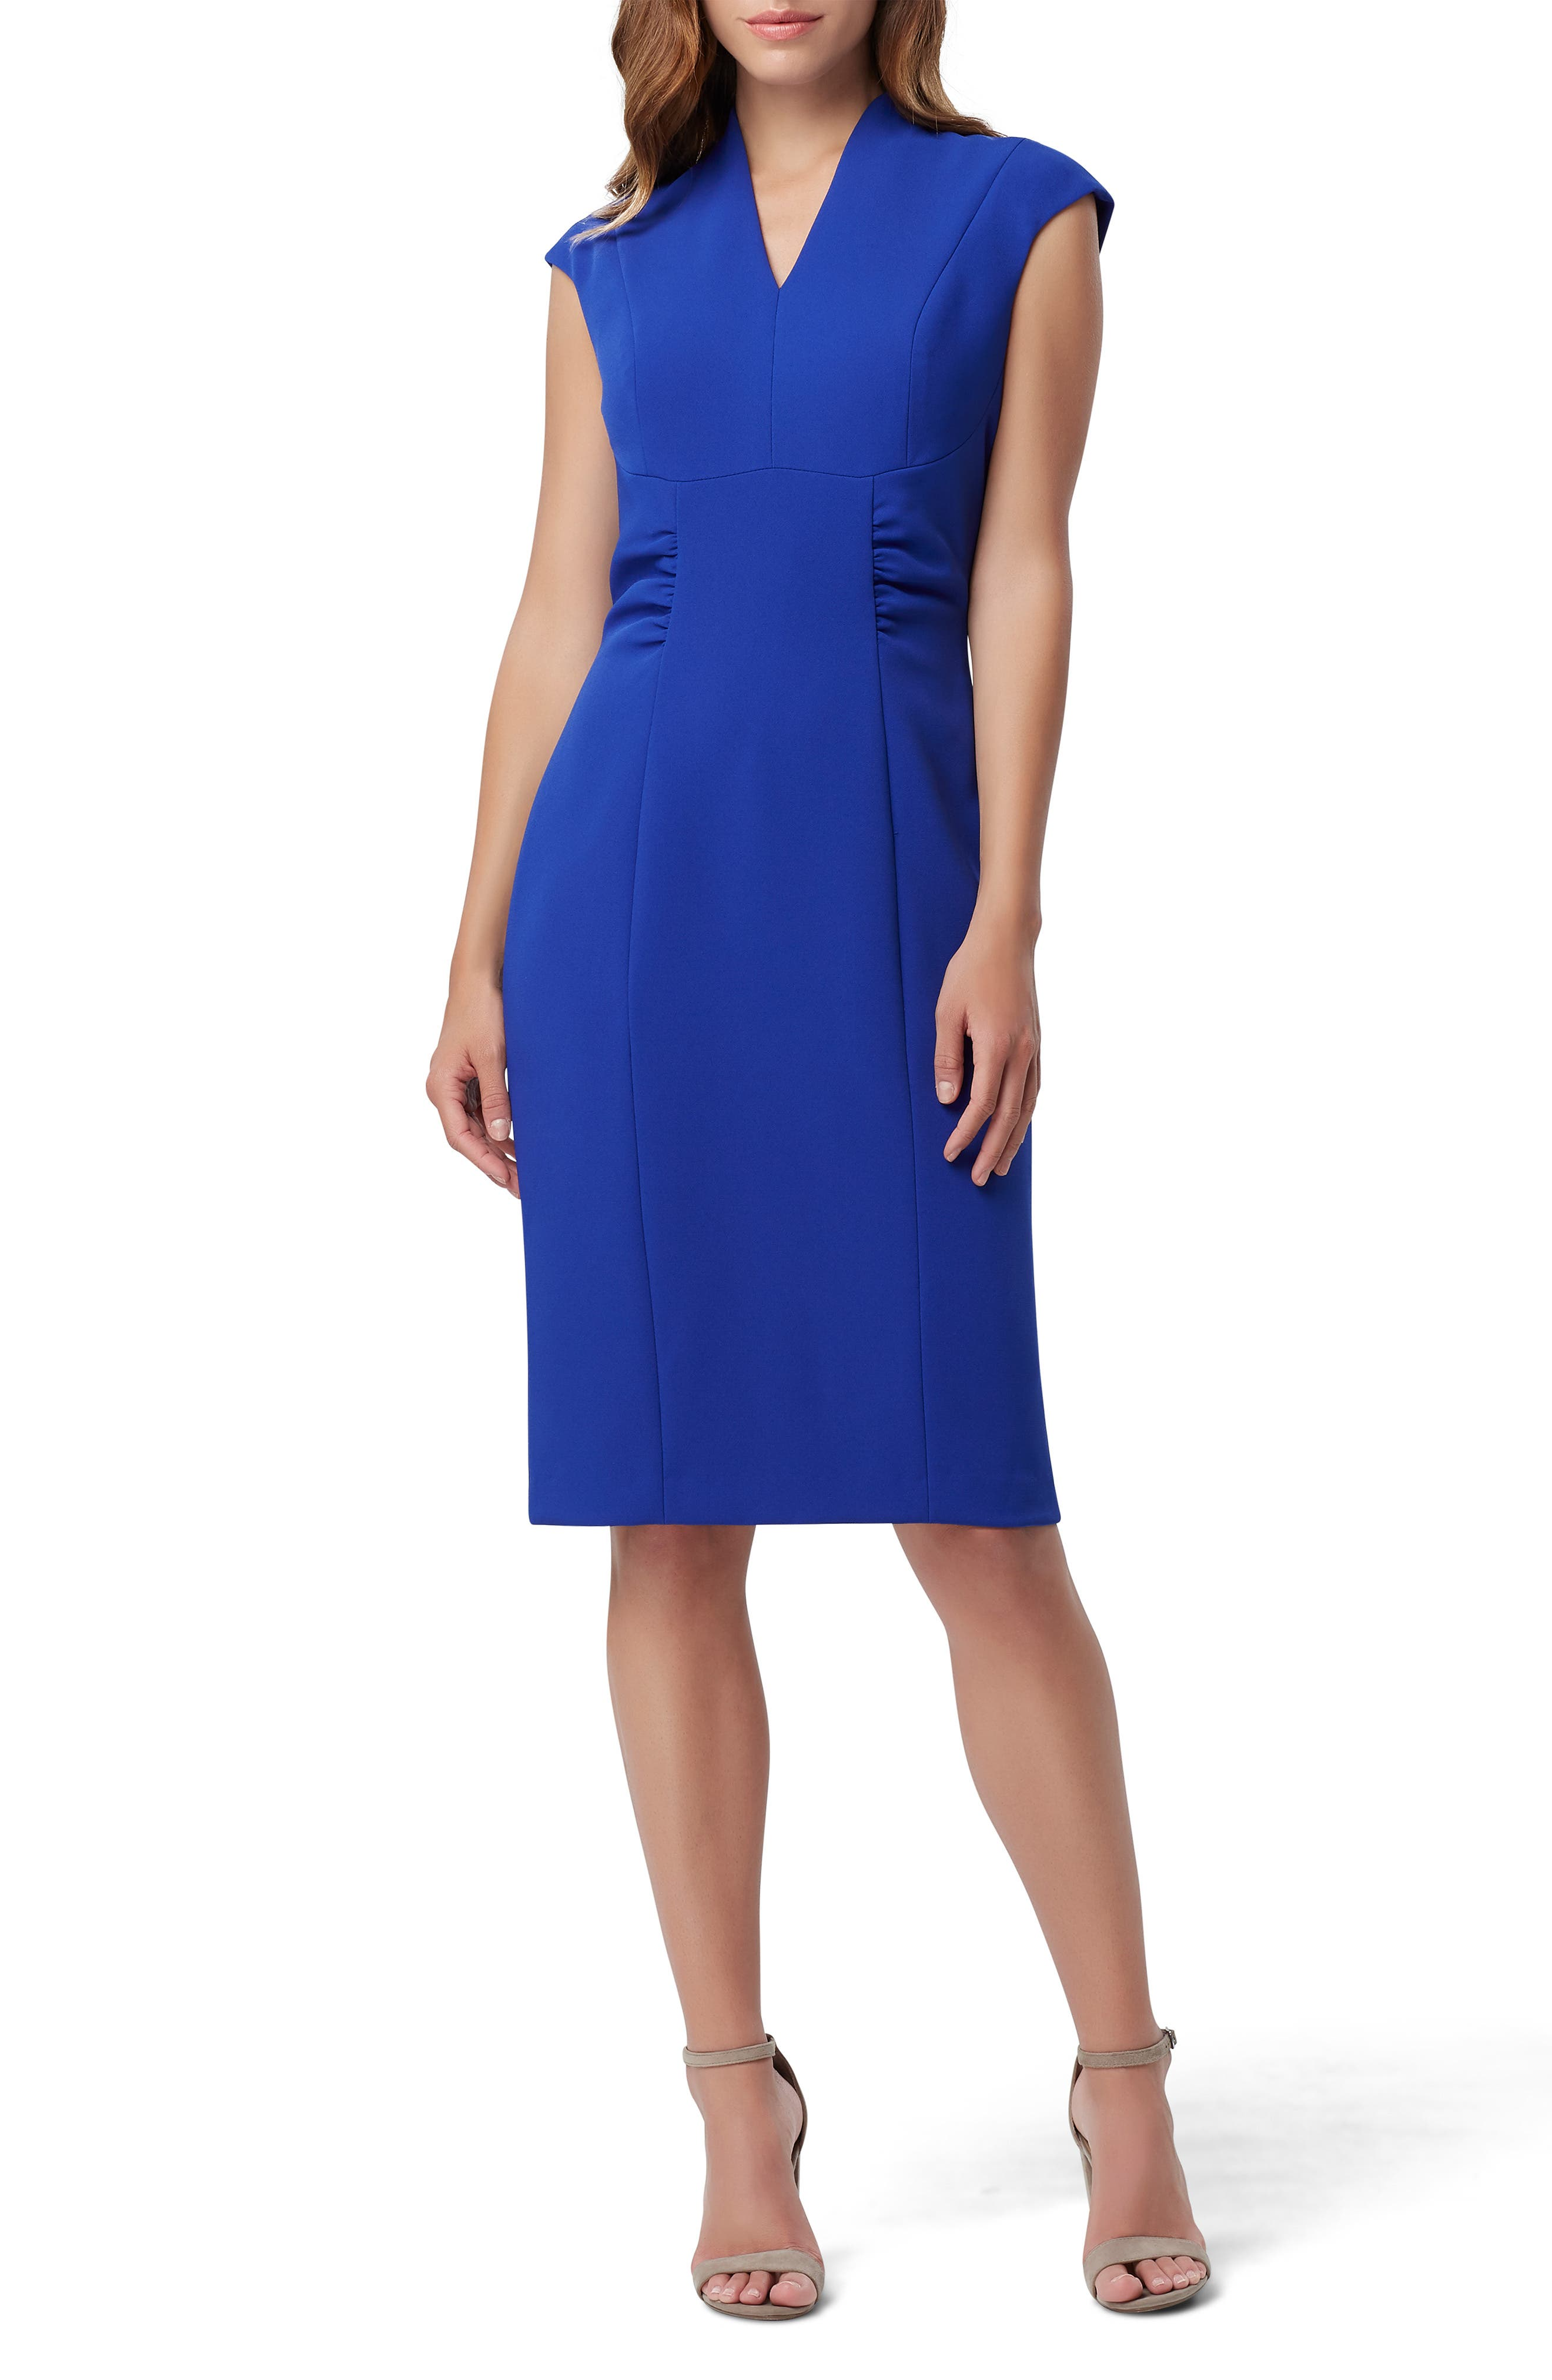 TAHARI,                             Crepe Sheath Dress,                             Main thumbnail 1, color,                             SPRING ROYAL